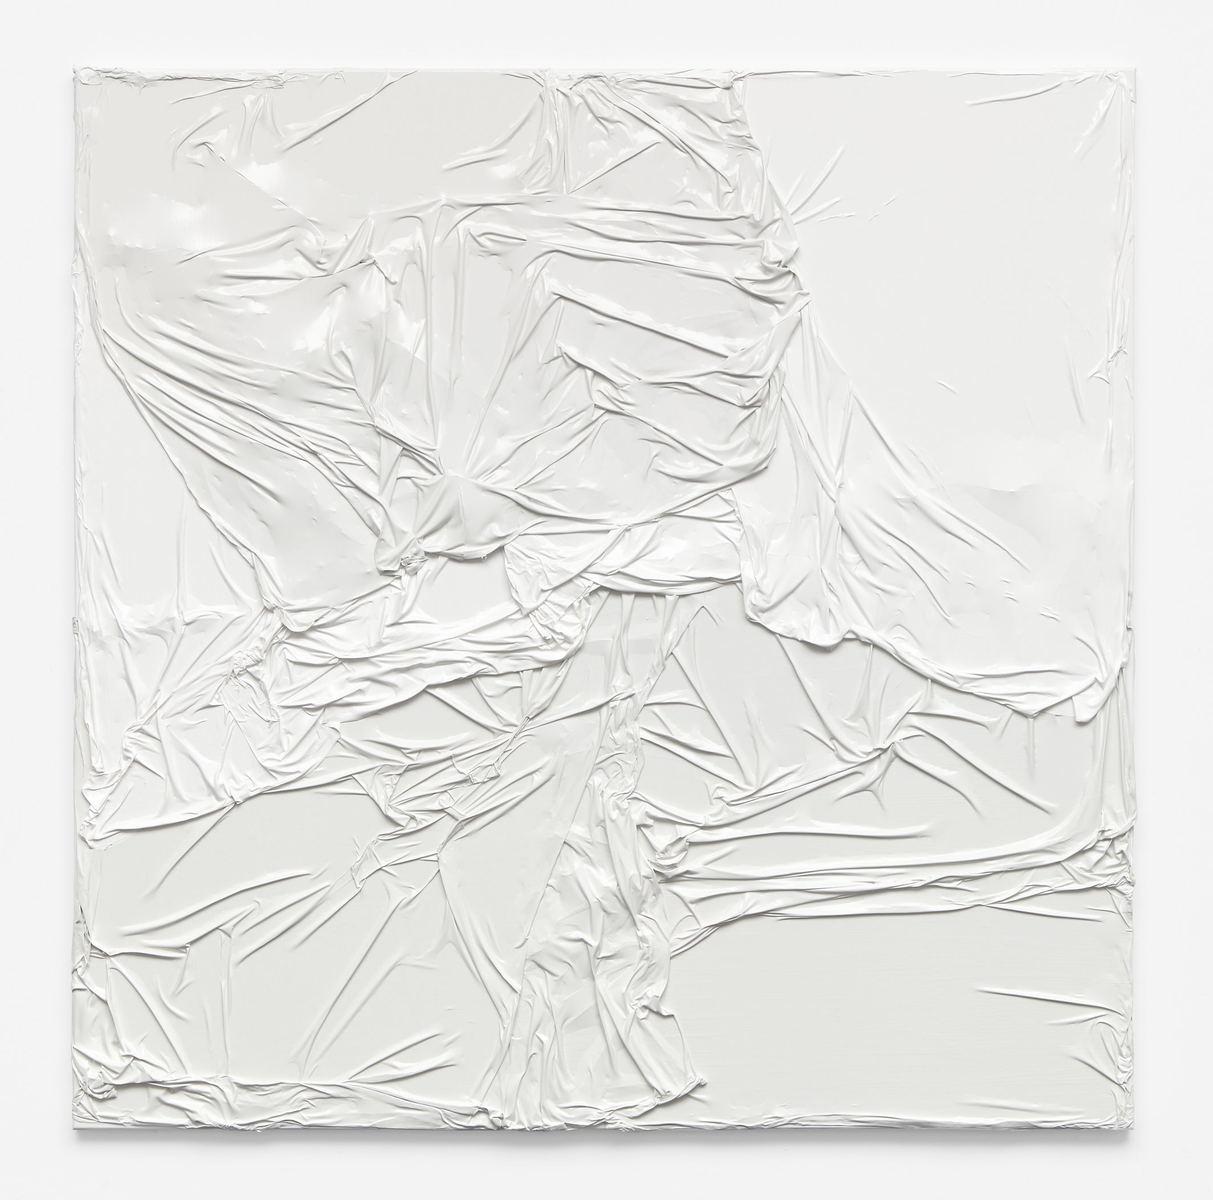 Untitled (WW)